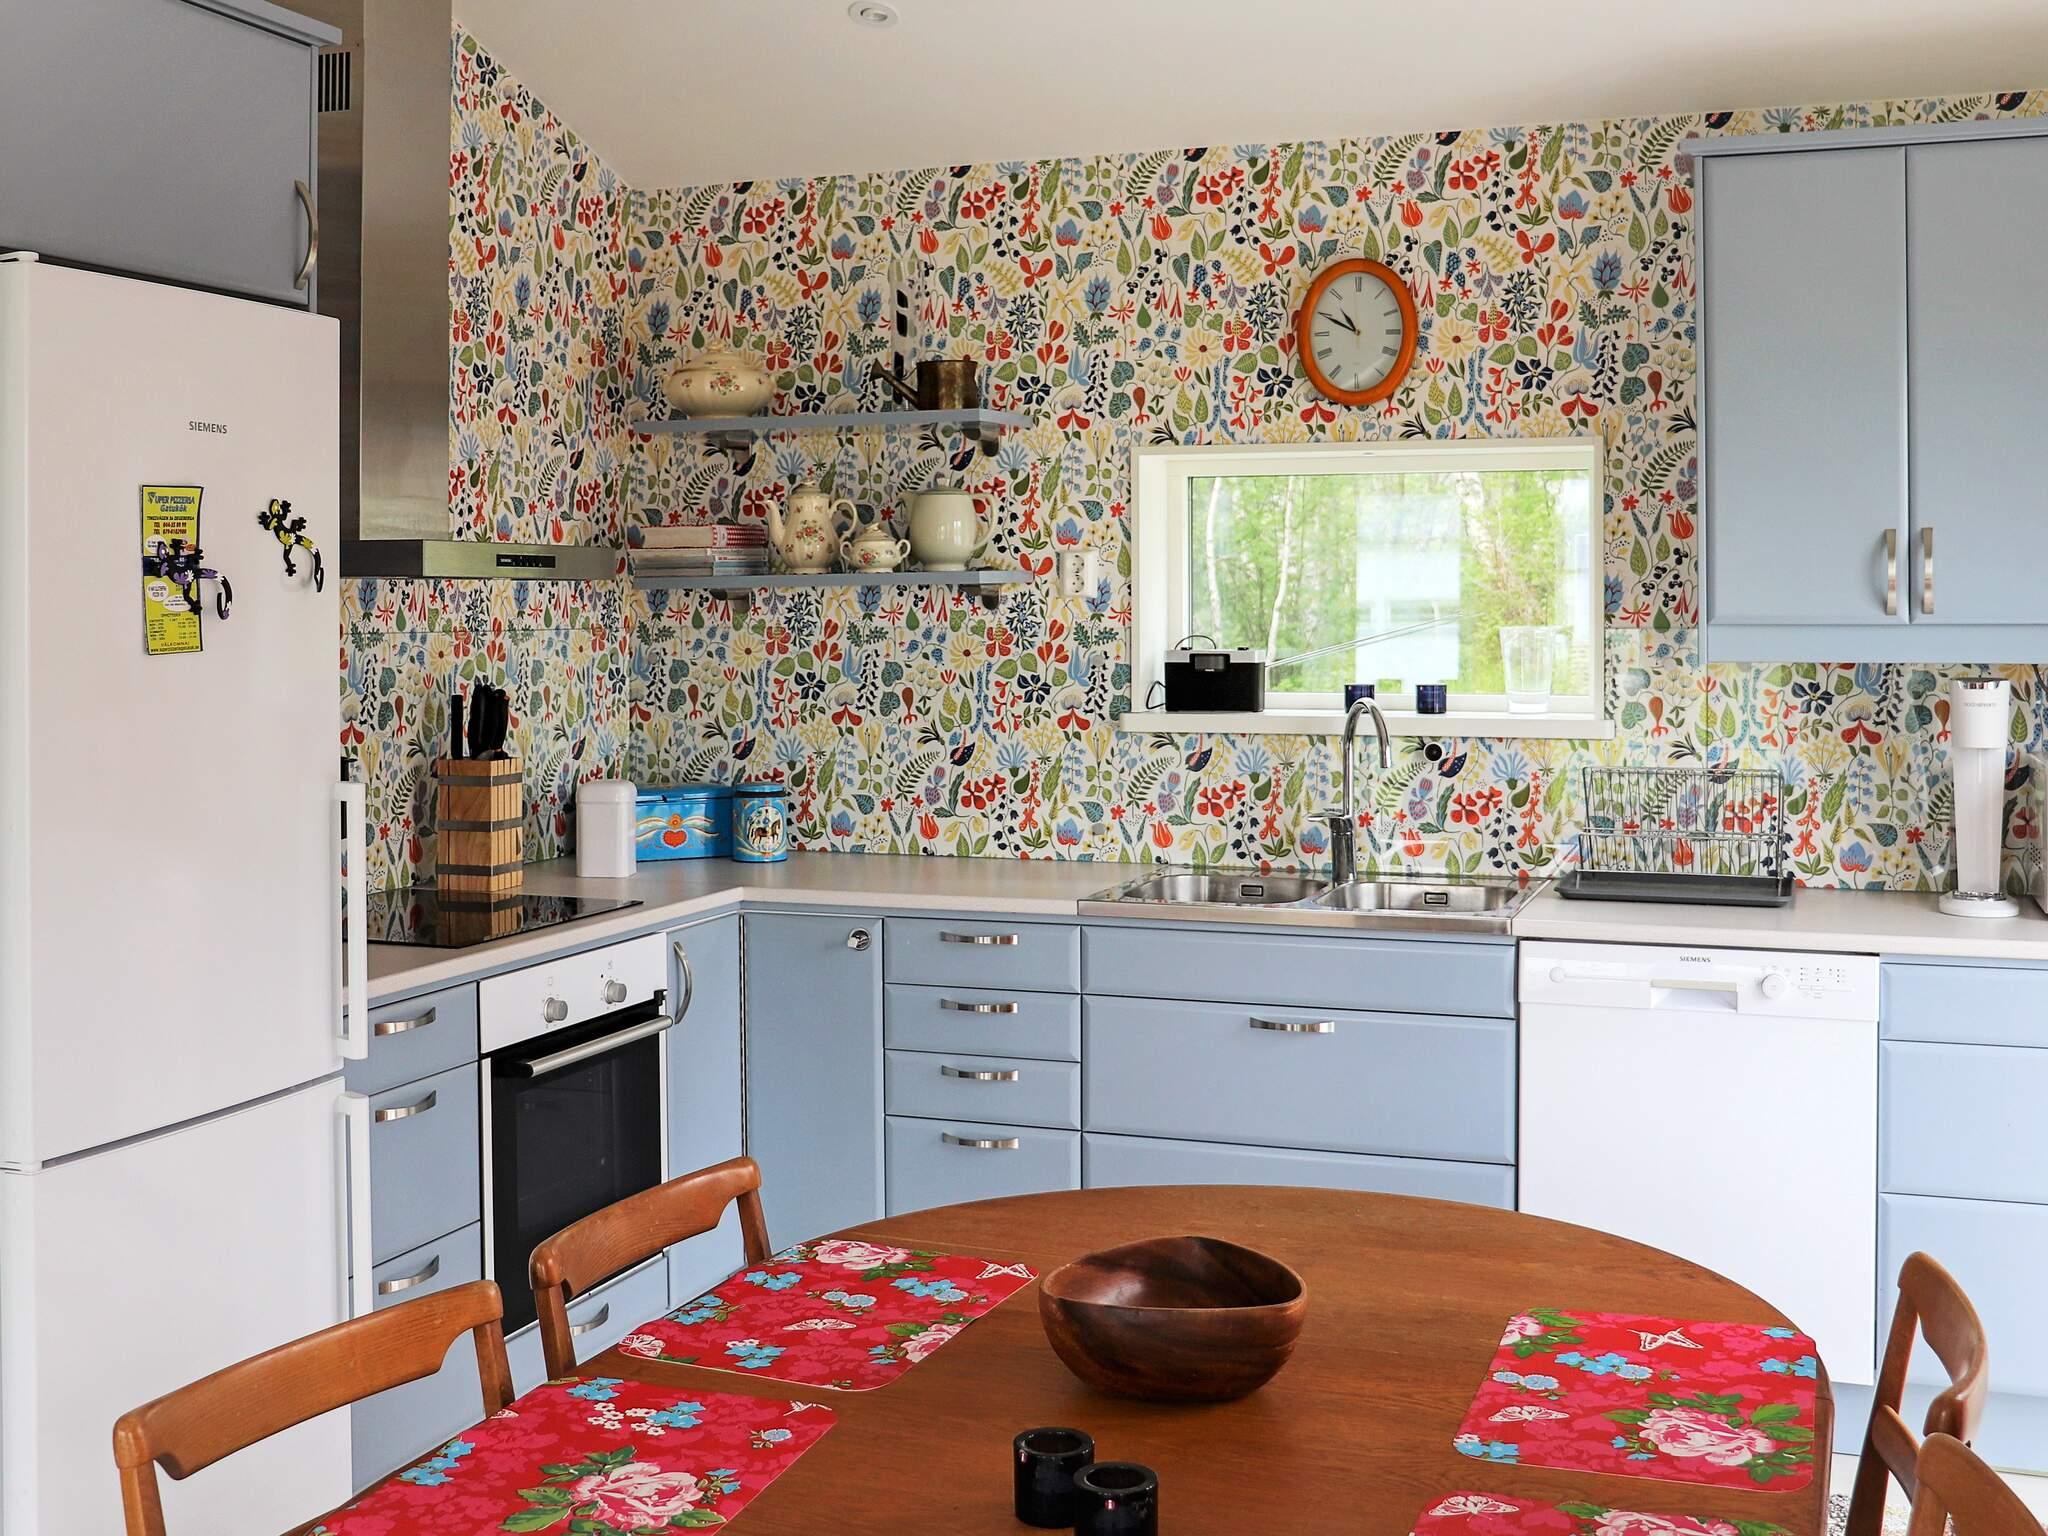 Ferienhaus Degeberga (2624324), Degeberga, Skane län, Südschweden, Schweden, Bild 3